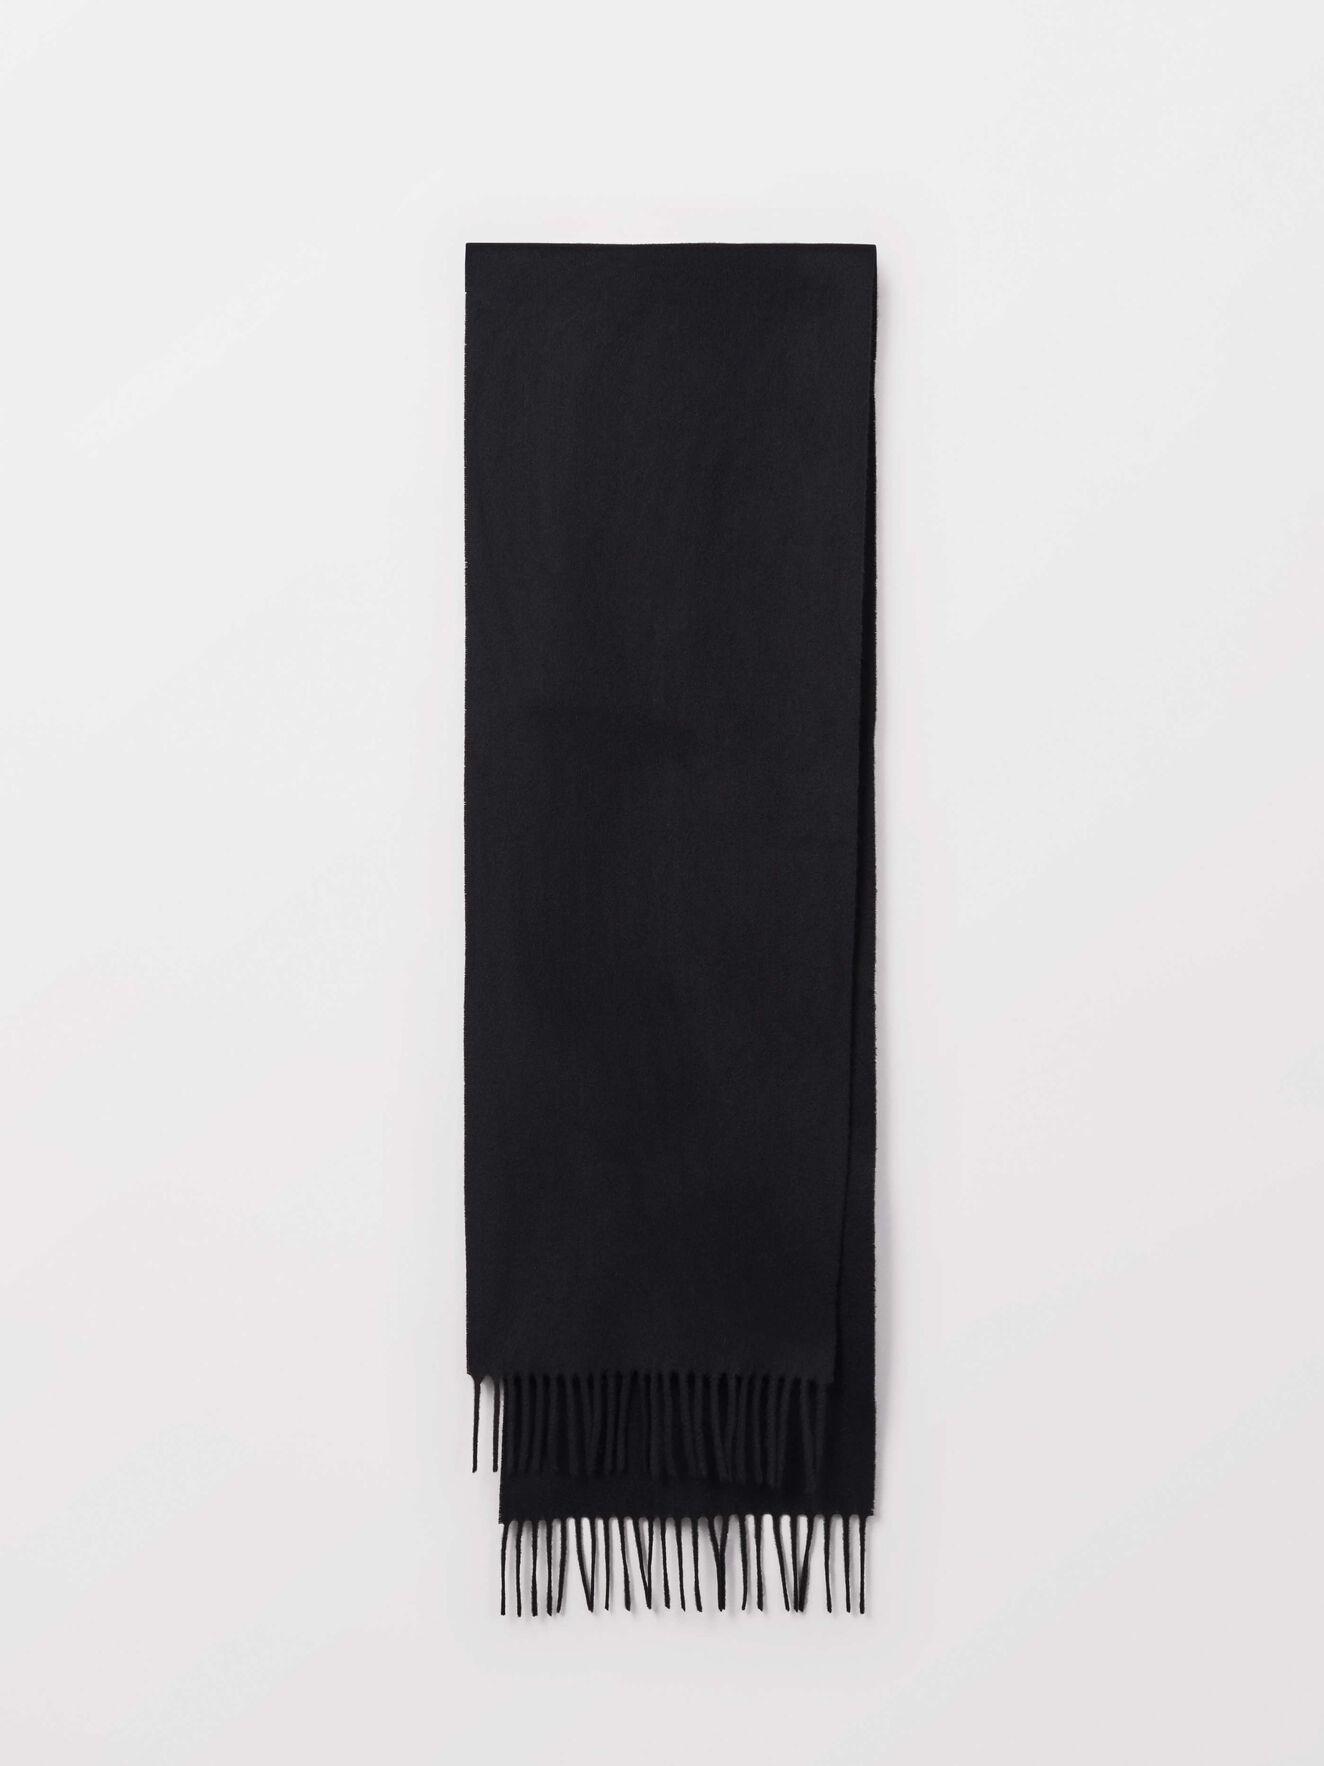 Sullan Schal in Black from Tiger of Sweden